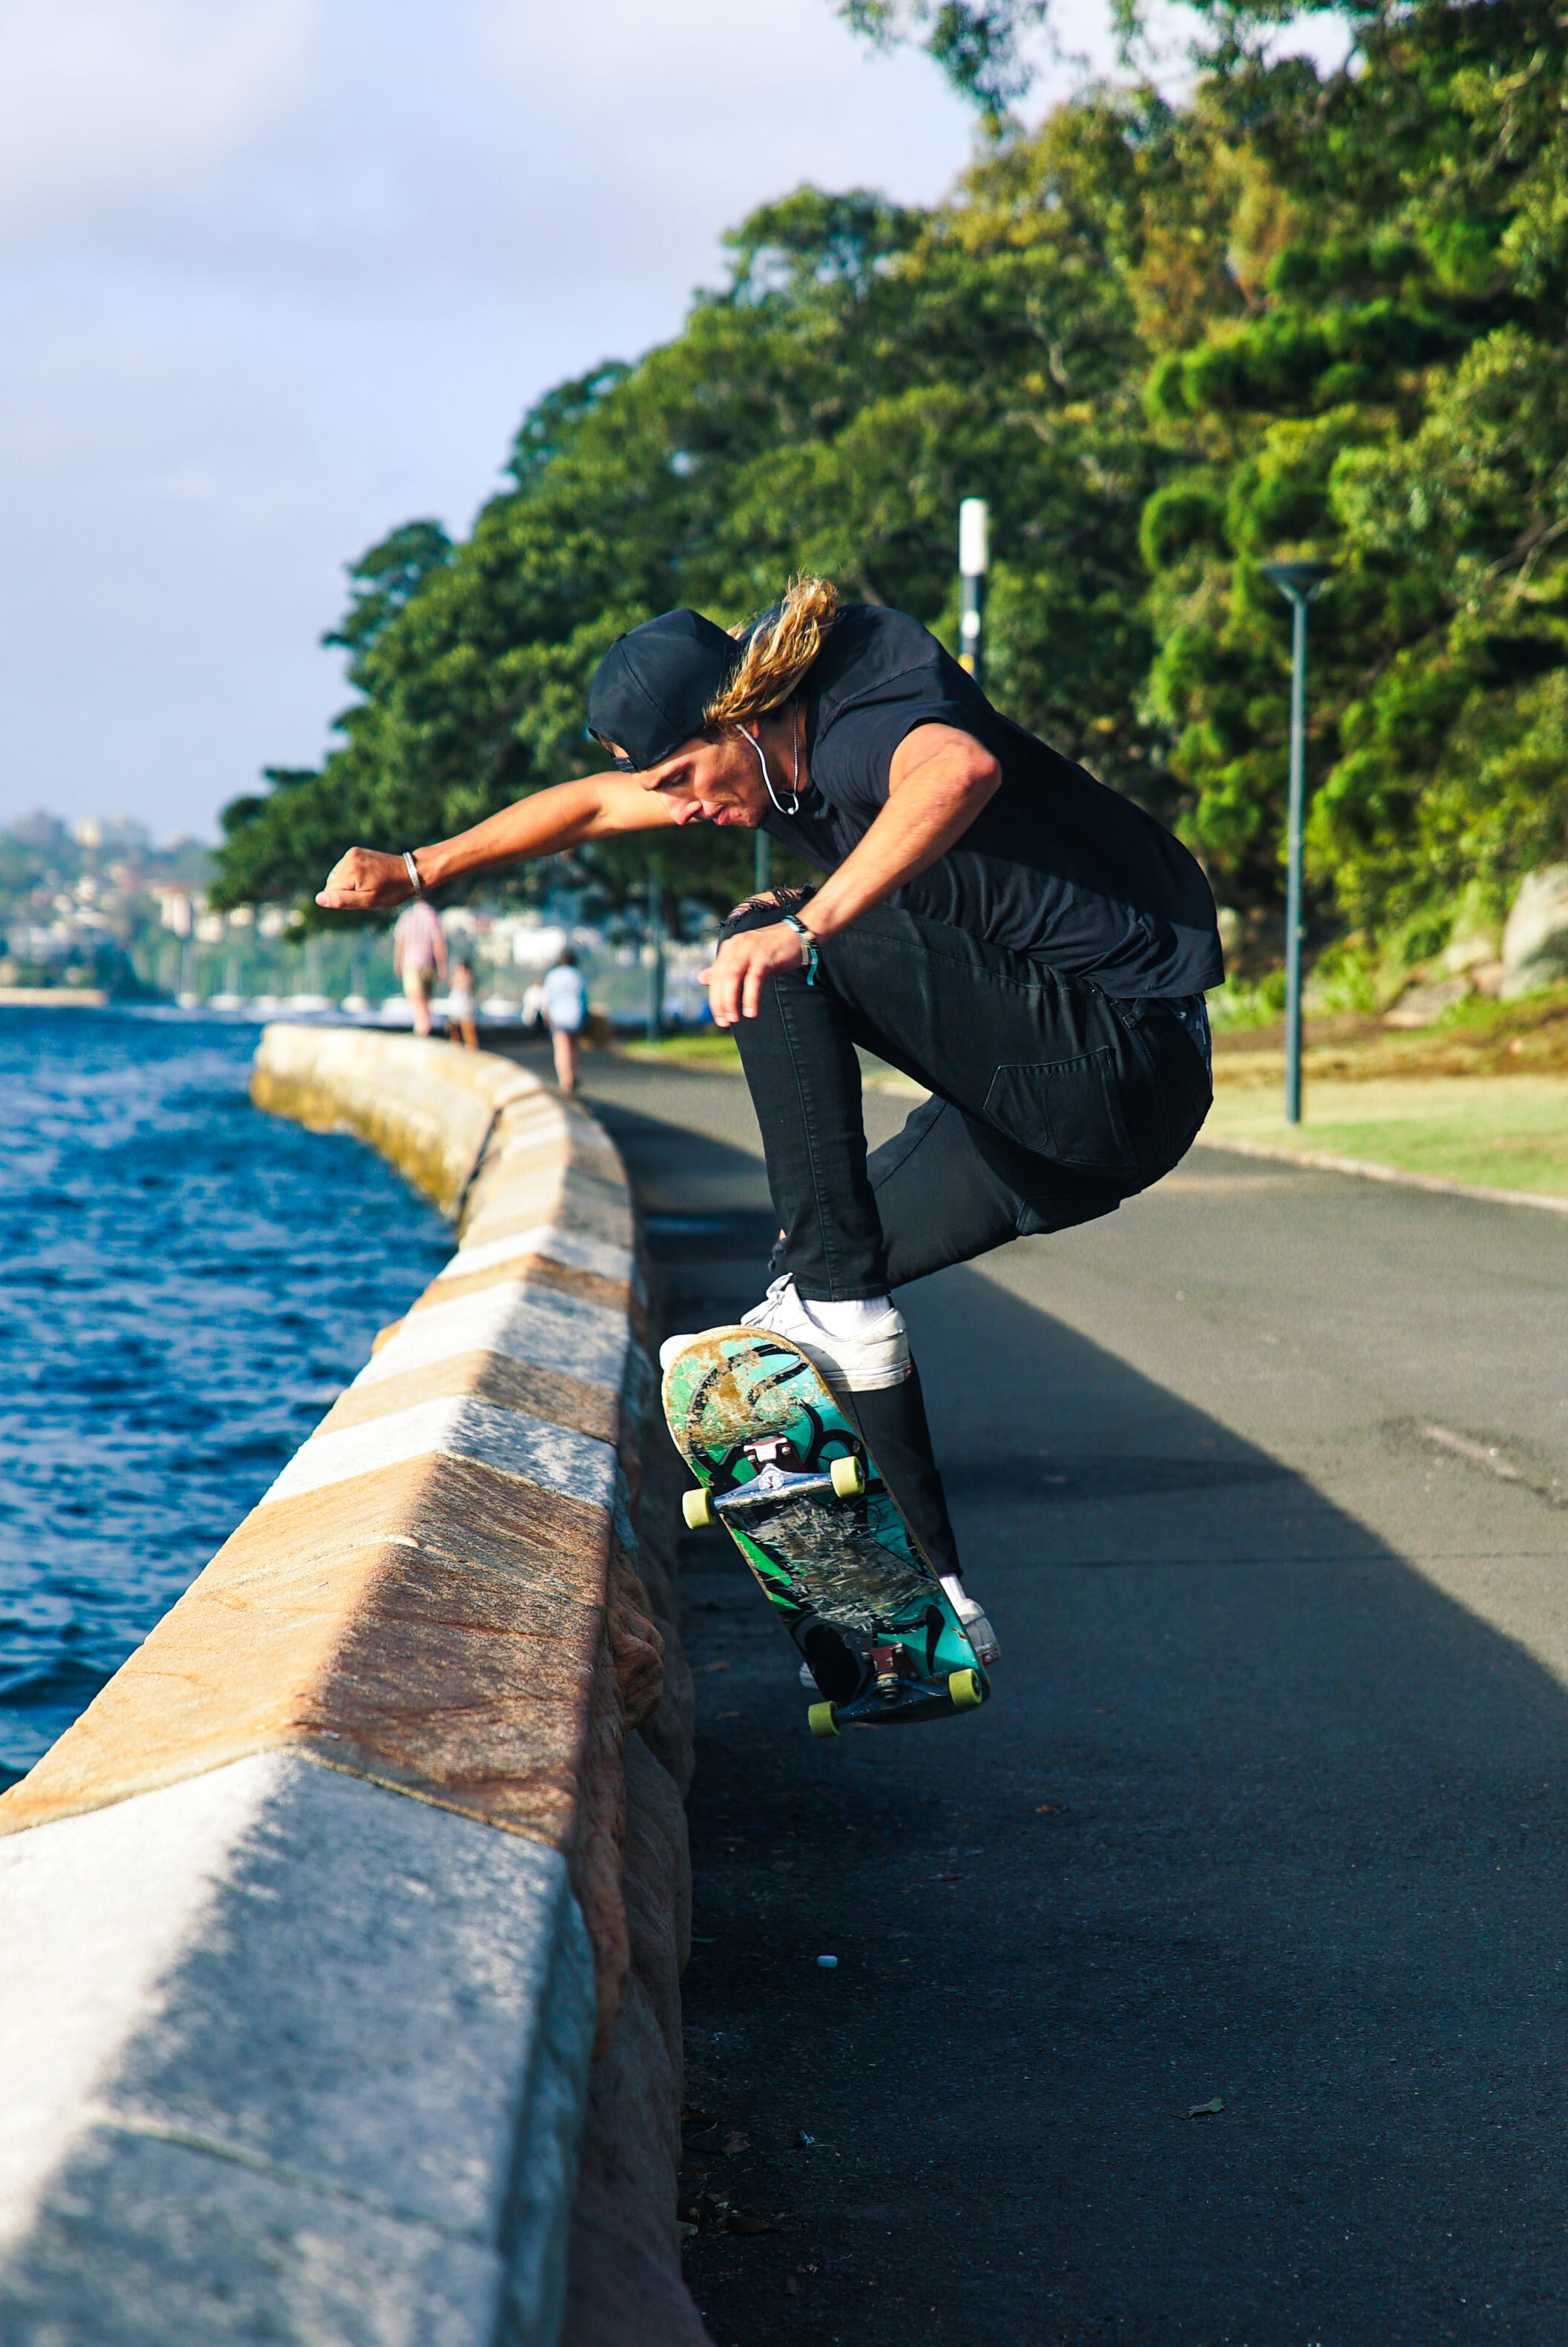 Person Skateboarding Near Lakeside